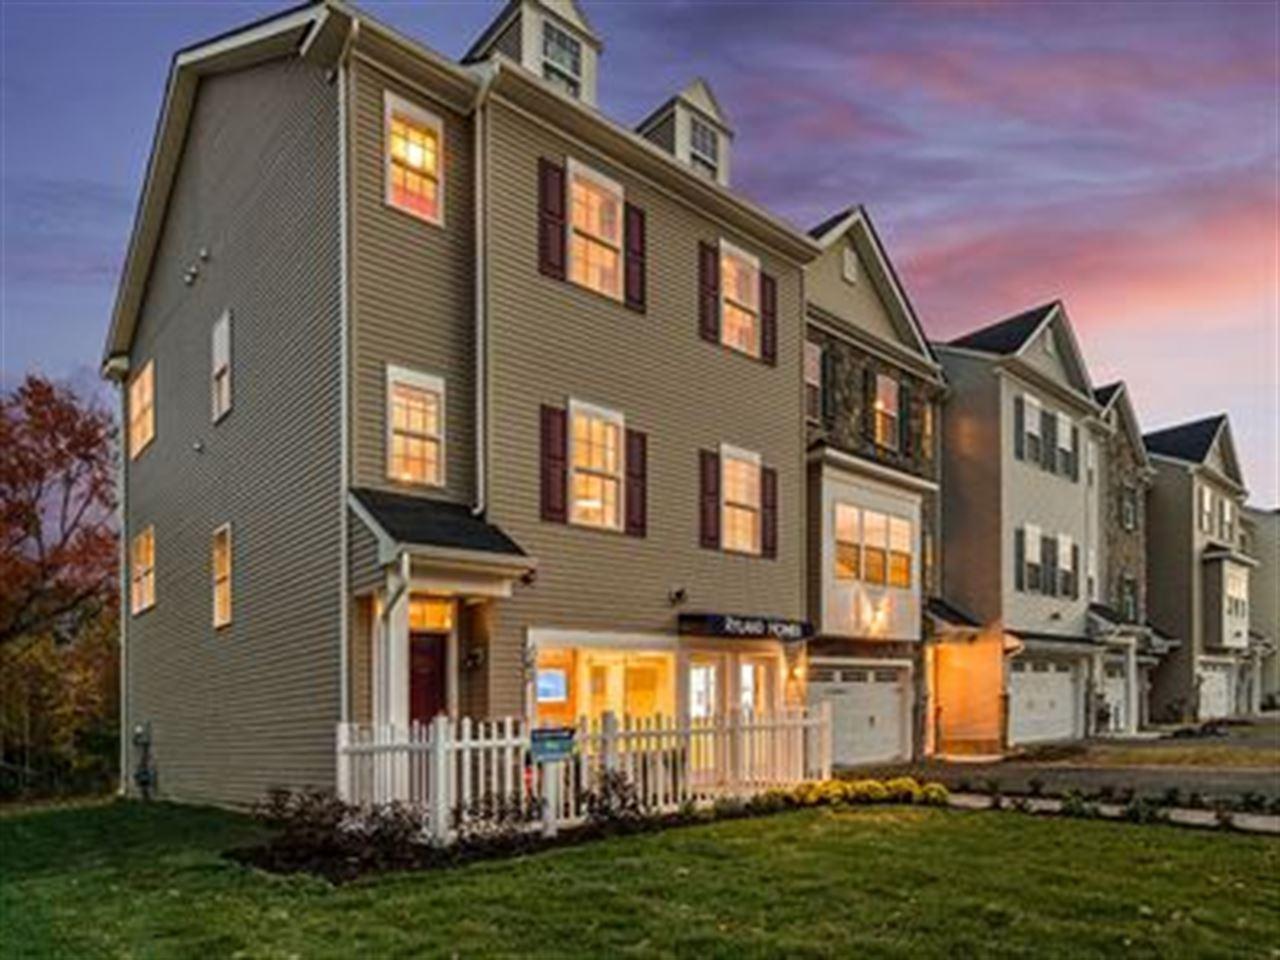 Multi Family for Sale at Ravenswood At Marlton - Larchmont 13 Lani Lane Marlton, New Jersey 08053 United States